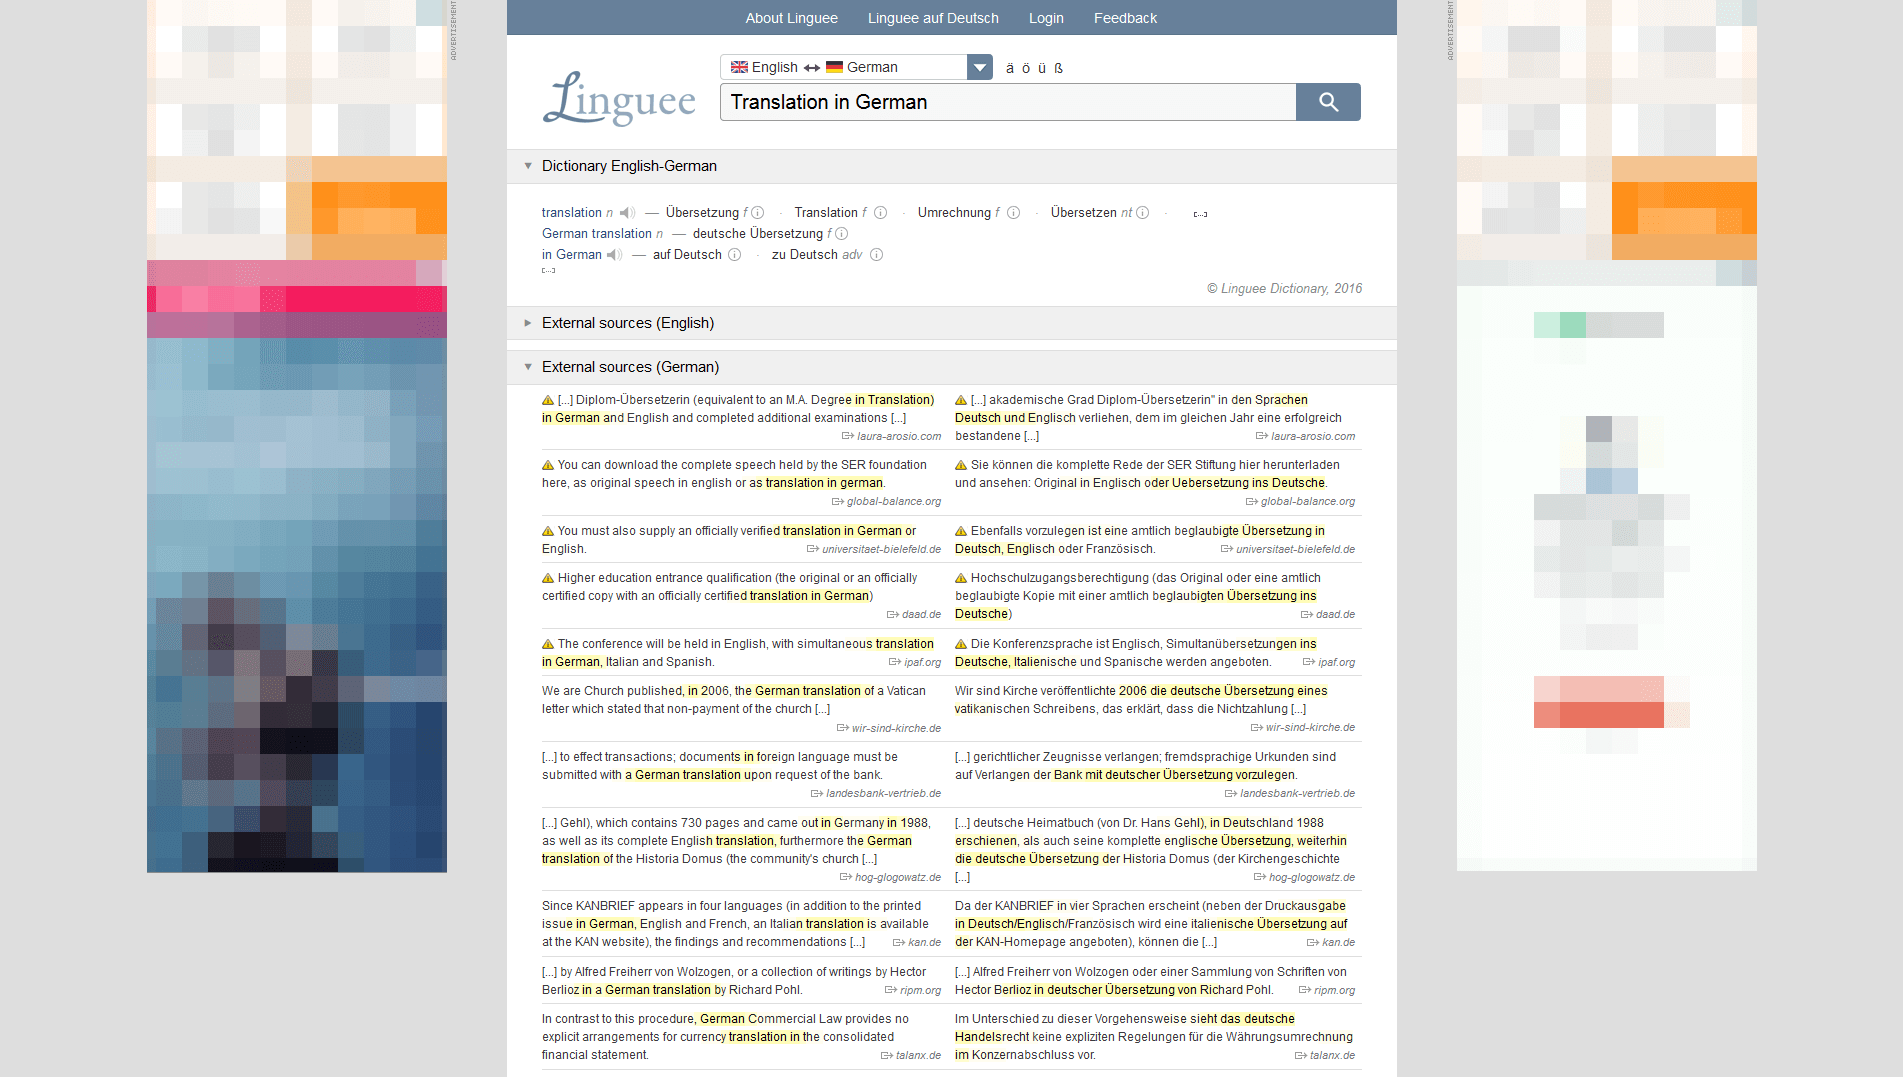 Google Translate Alternatives - 1&1 IONOS